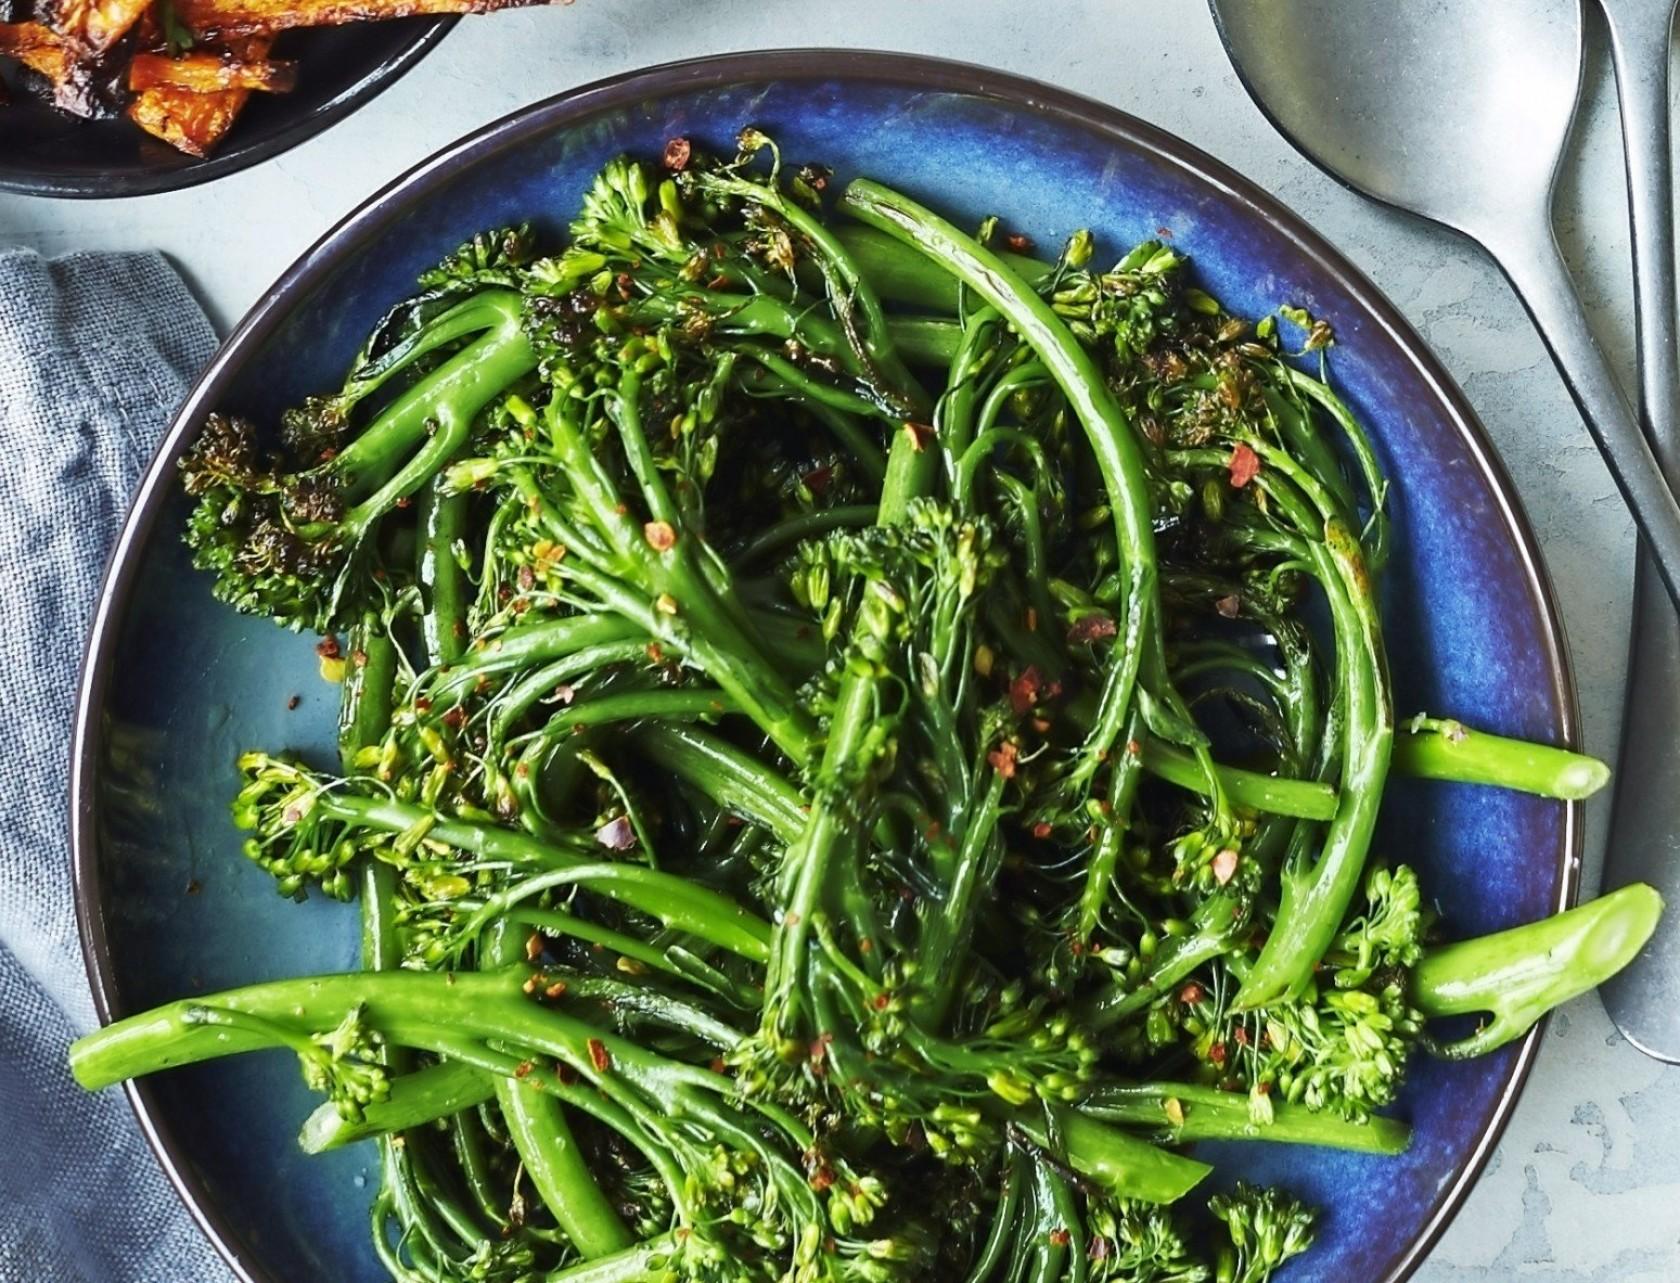 Lynstegt aspargesbroccoli med chili - det perfekte tilbehør!